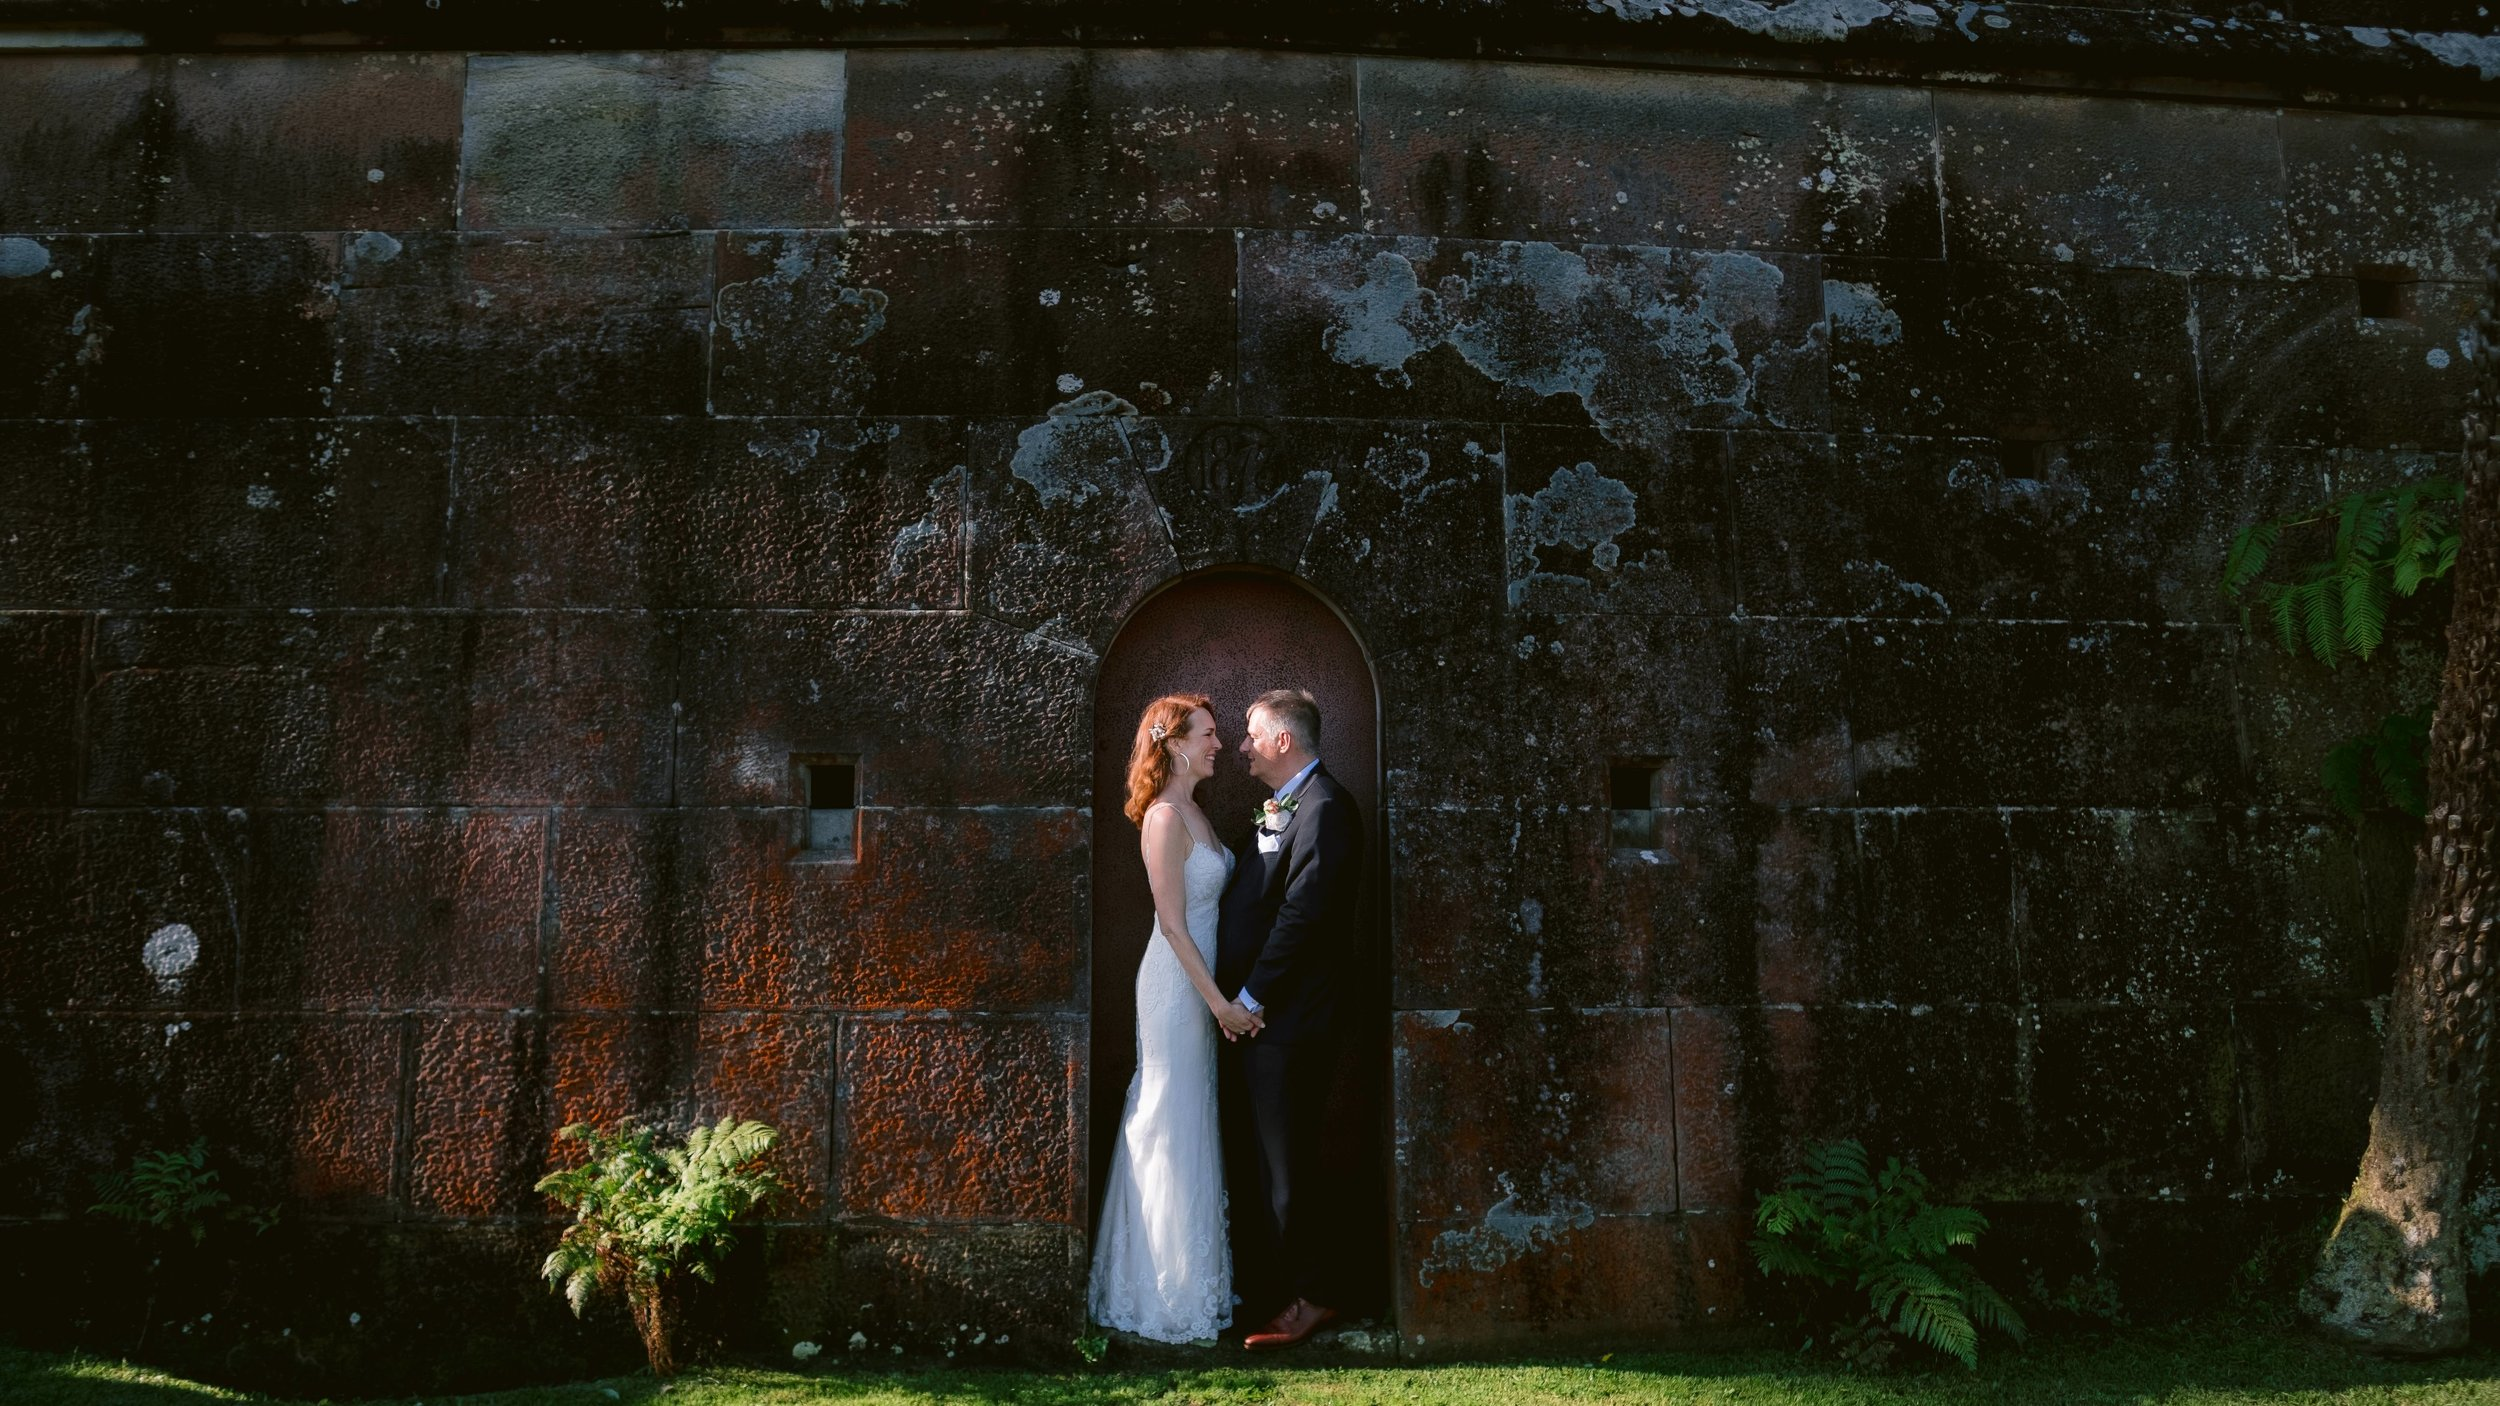 Simone and Klaus Gunners Barracks Mosman Sydney Wedding by Milton Gan Photography1.jpg